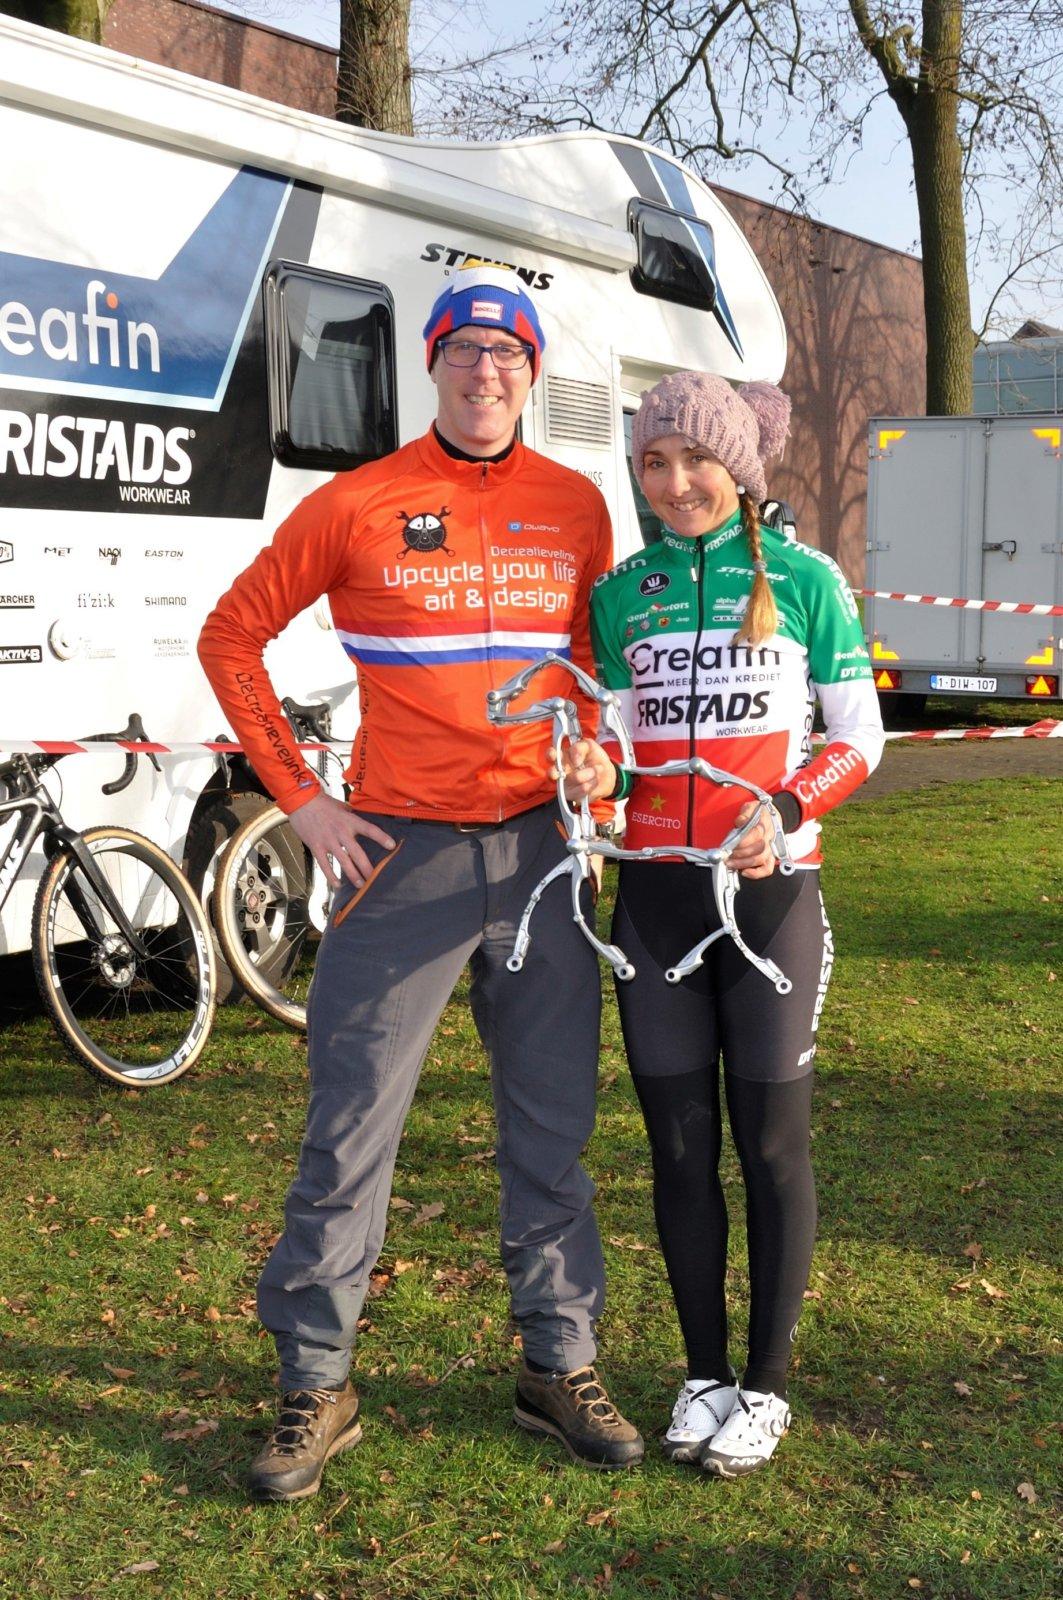 Cyclingartist Decreatievelink With Italian XCross And MTB Champion Eva Lechner